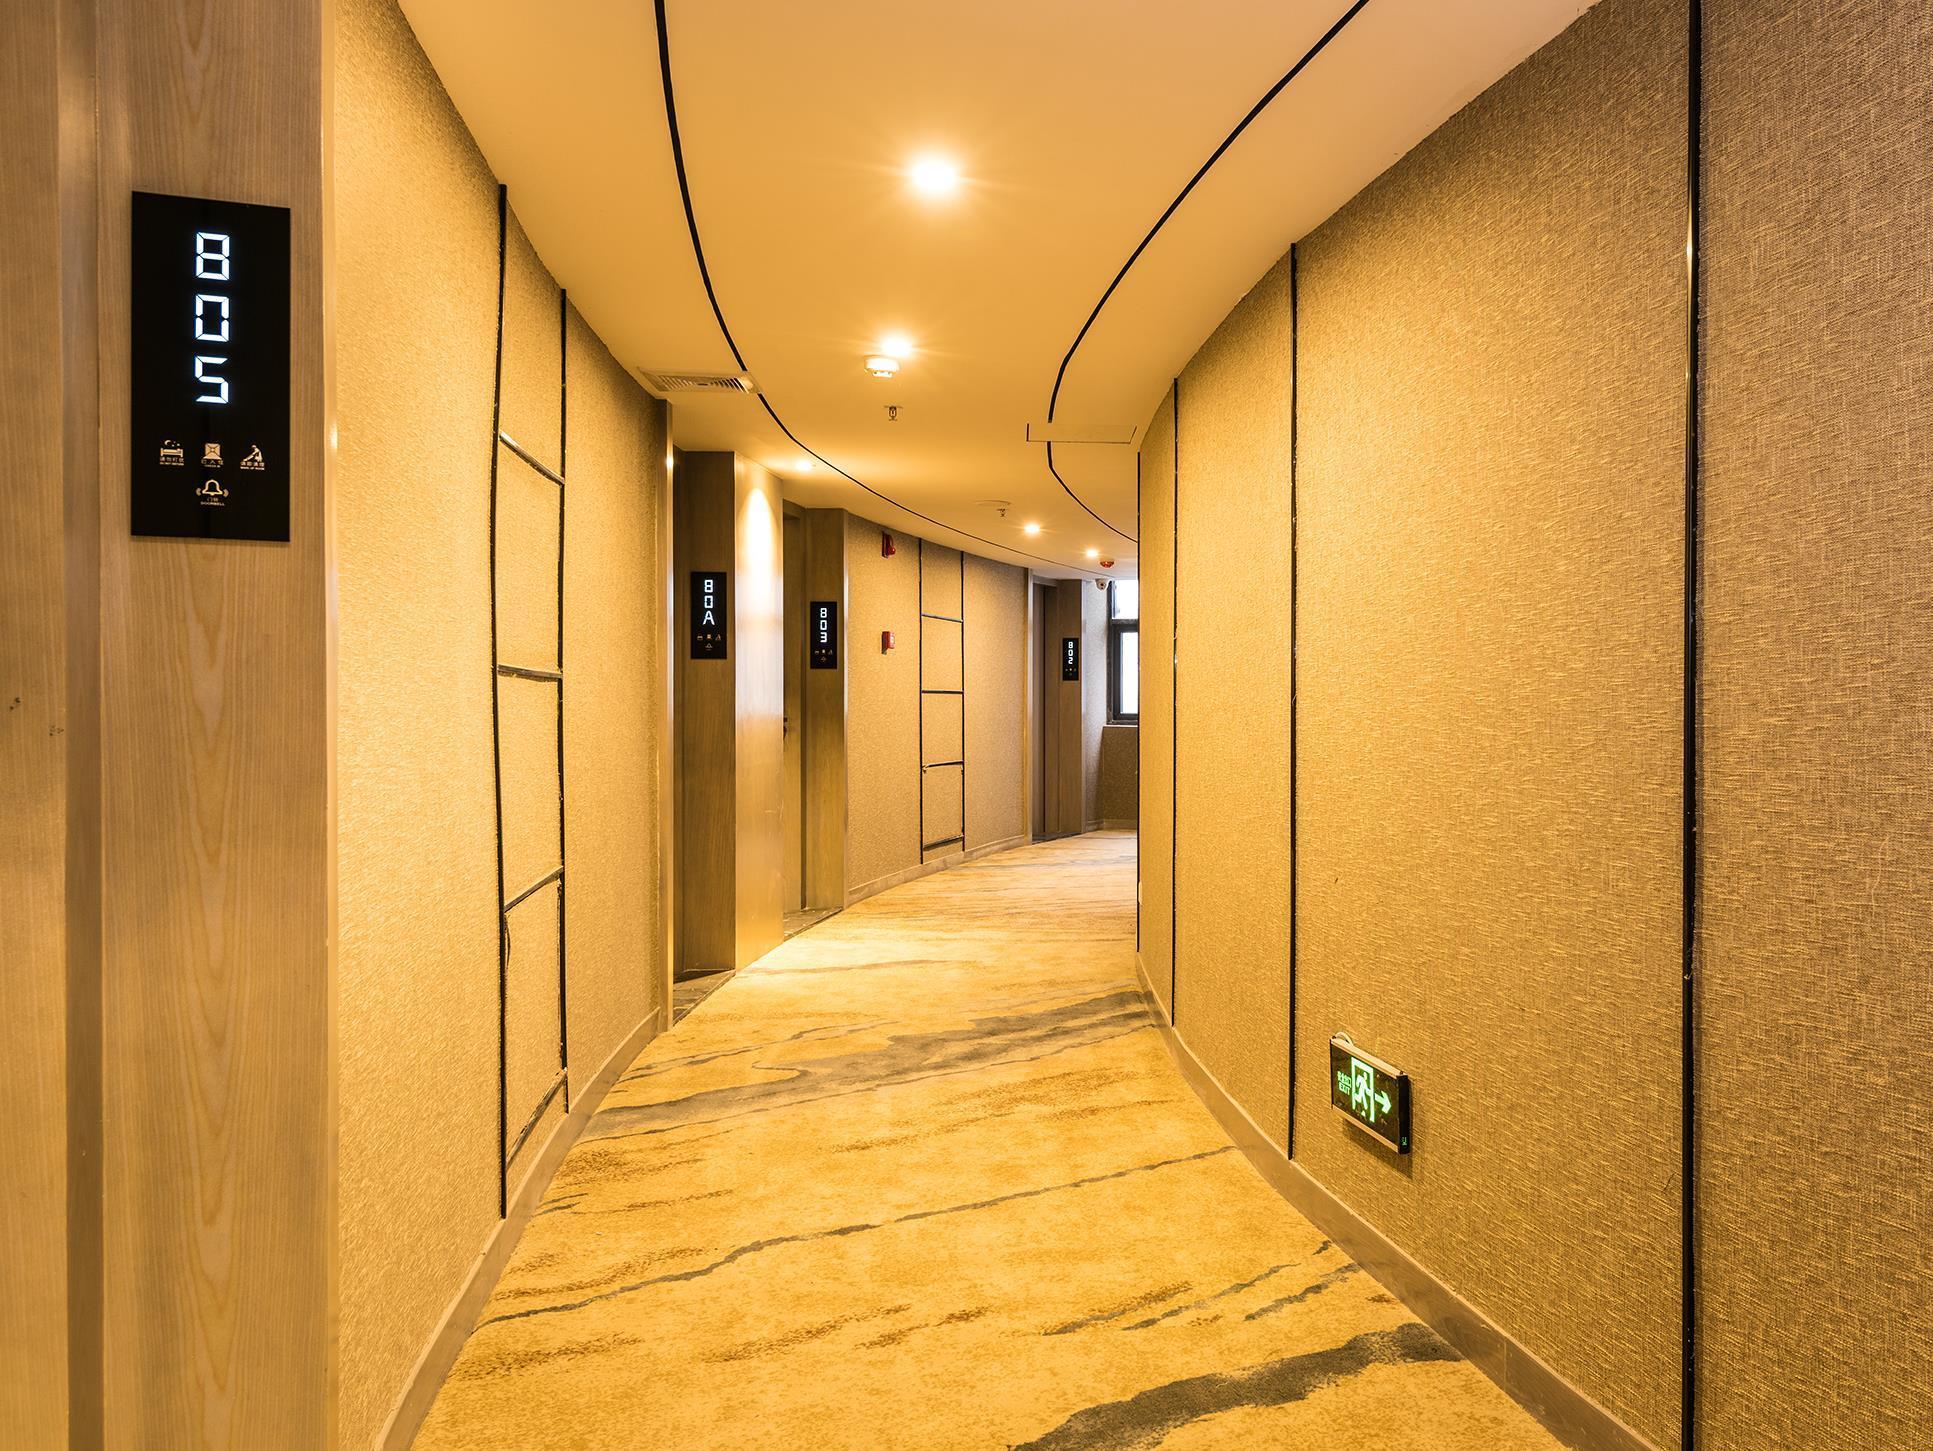 Zhuhai Tujia Sweetome Service Apartment Lovers Road Jingdu Building, Zhuhai